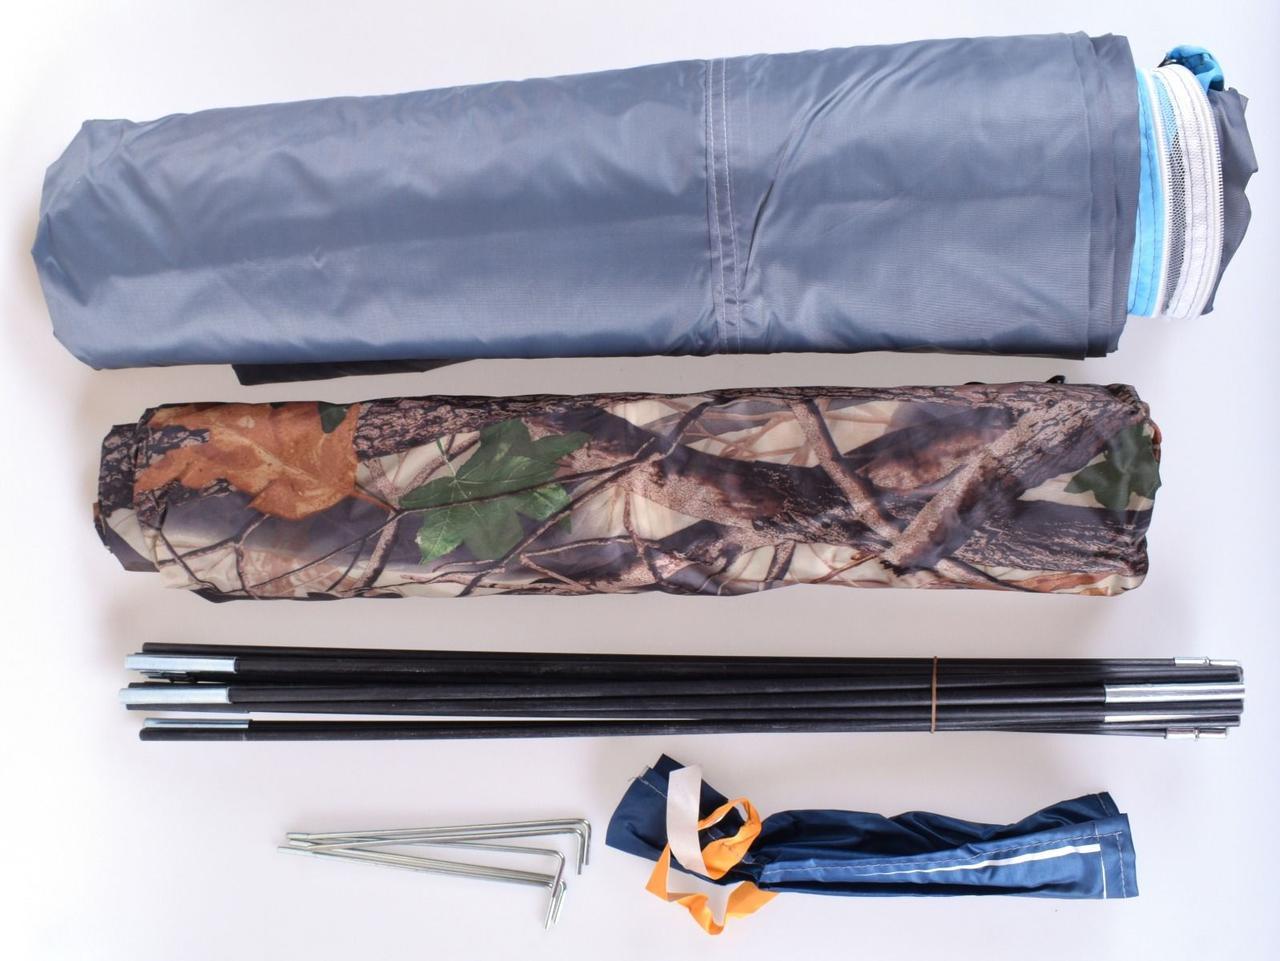 Палатка 3-х местная Hanlu SJ-D22767, 200*200*130 см., (190Т, 3000 мм., 2,4 кг.) - фото 2